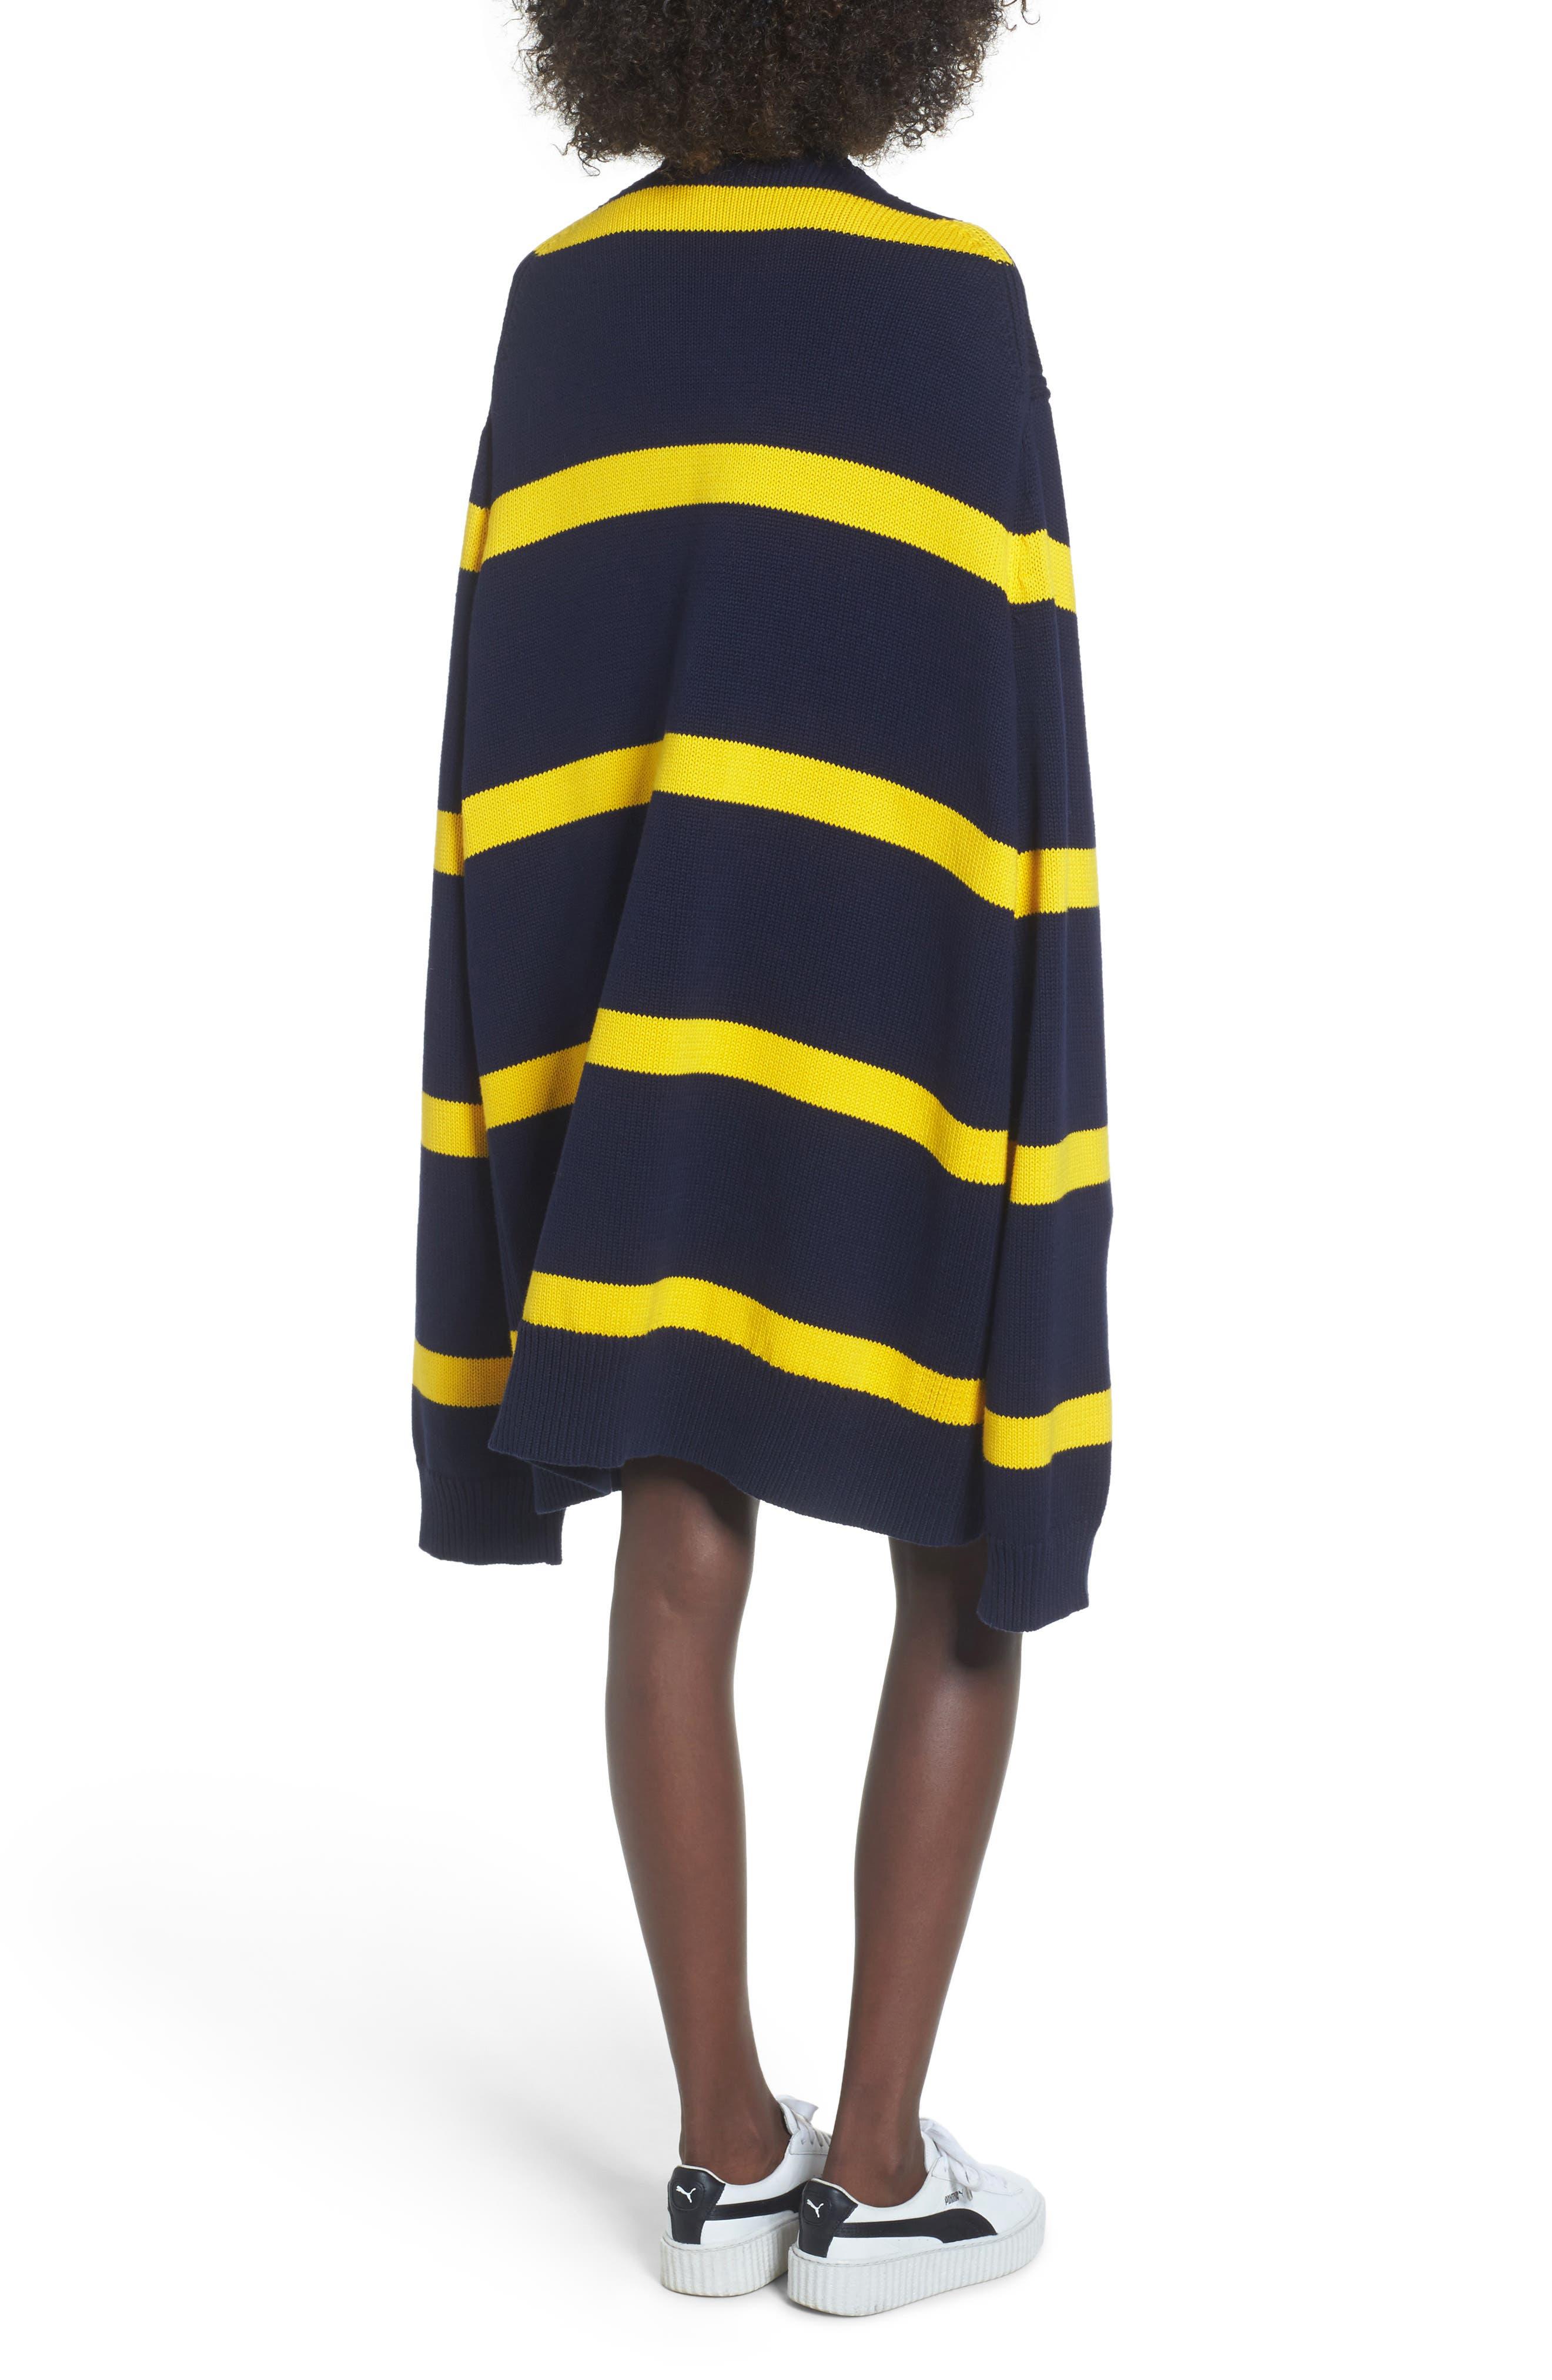 PUMA by Rihanna Longline Stripe Sweater,                             Alternate thumbnail 2, color,                             Navy/ Yellow Stripe